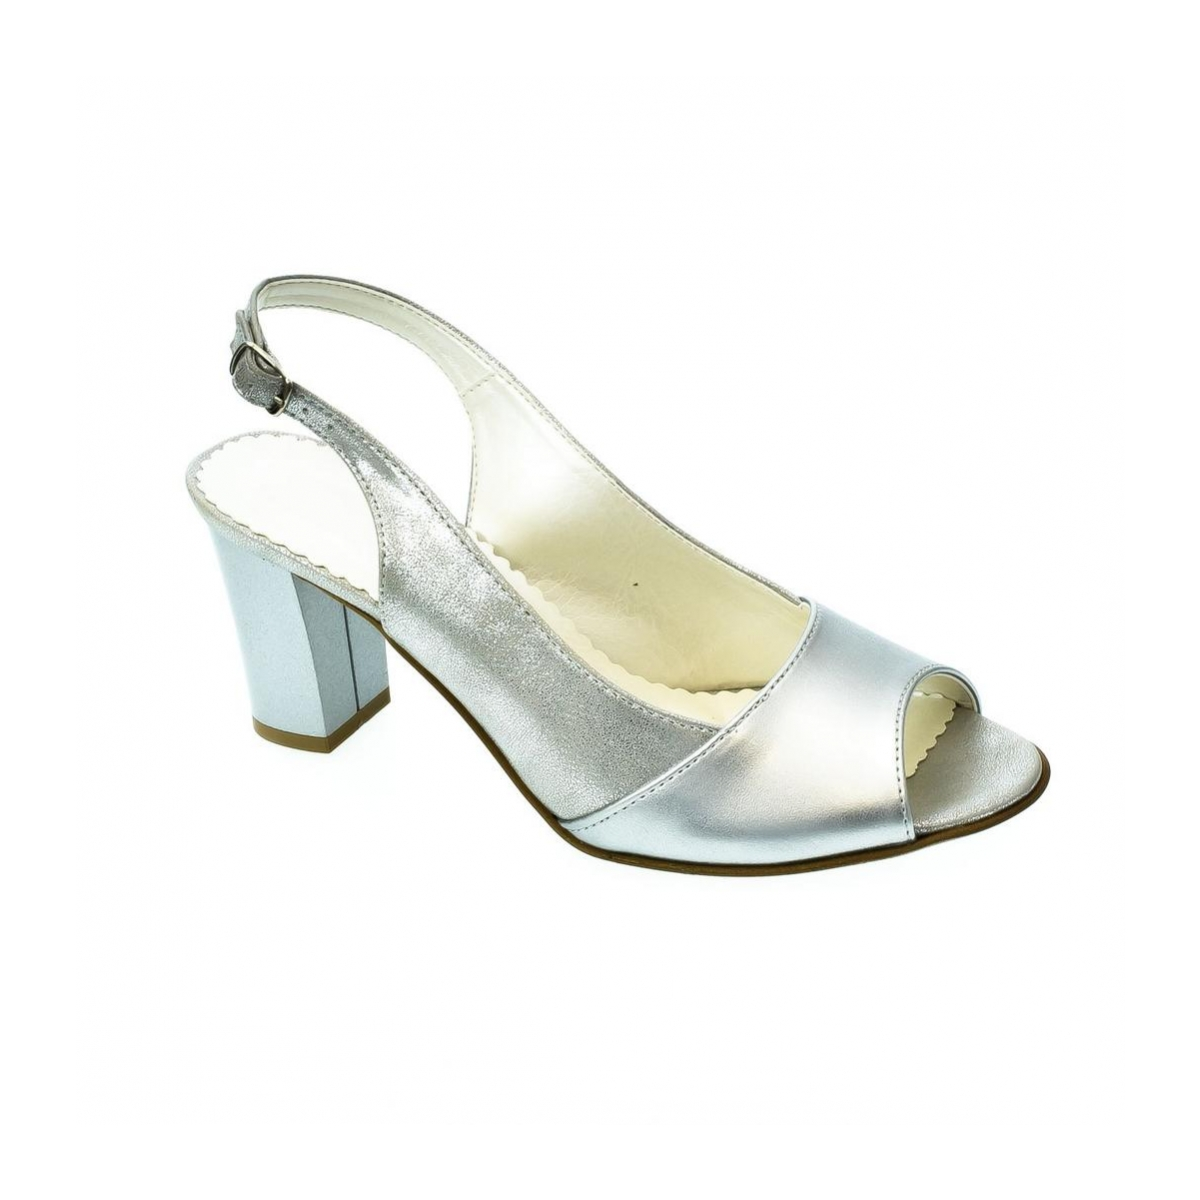 c03b6693b3a6 Dámske strieborné sandále SAINA - 7